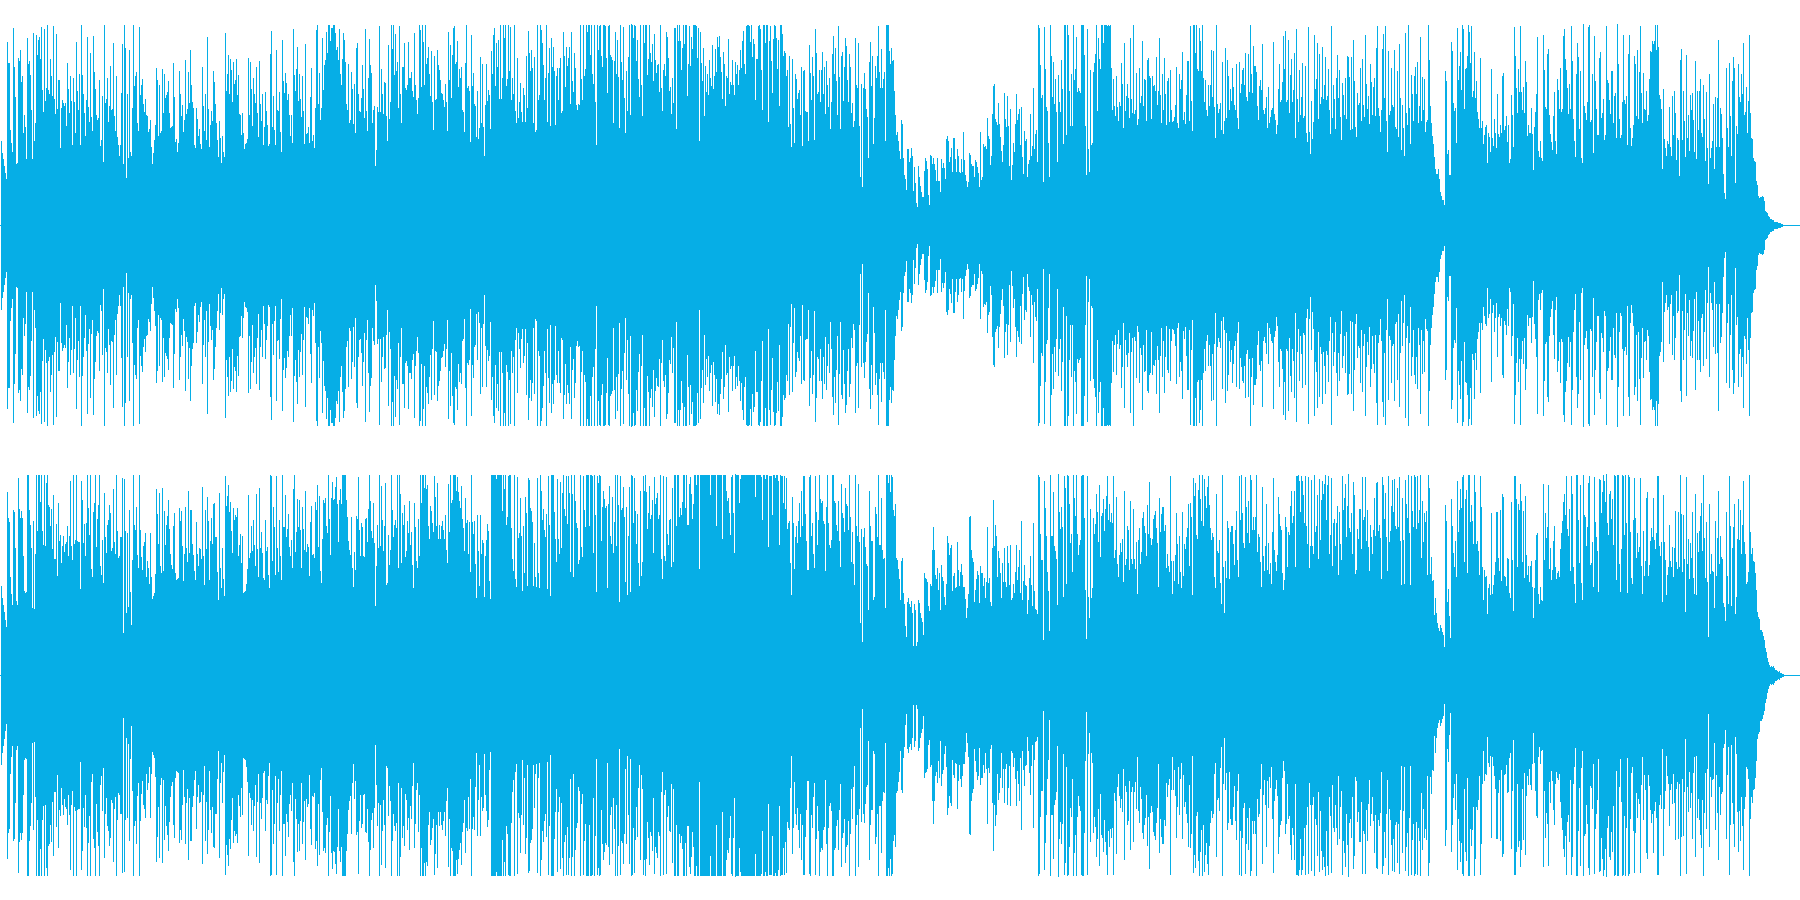 Happyなミディアム洋楽Popsの再生済みの波形